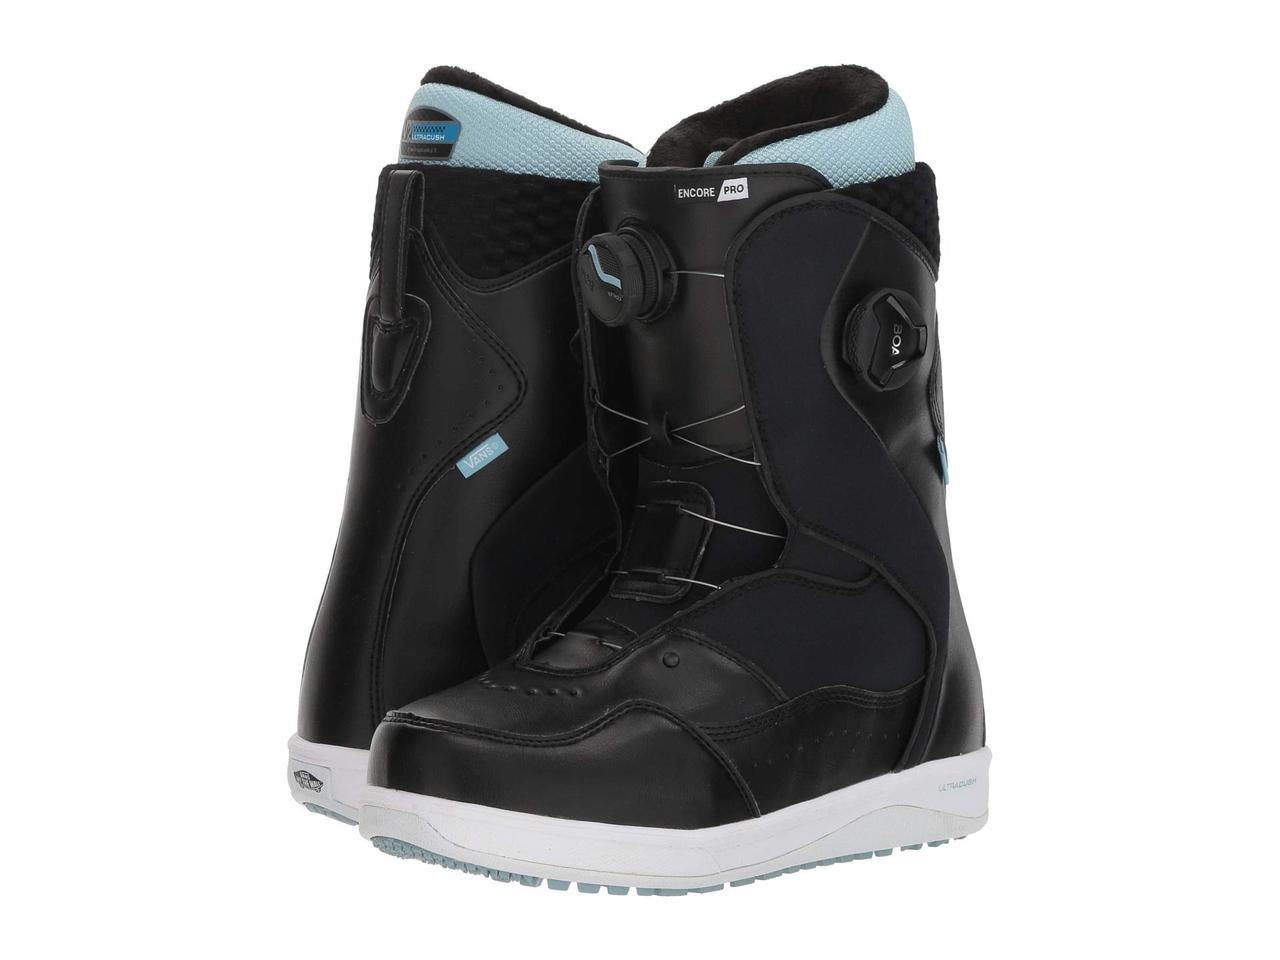 Ботинки/Сапоги (Оригинал) Vans Encore™ Pro '18 Black/Light Blue